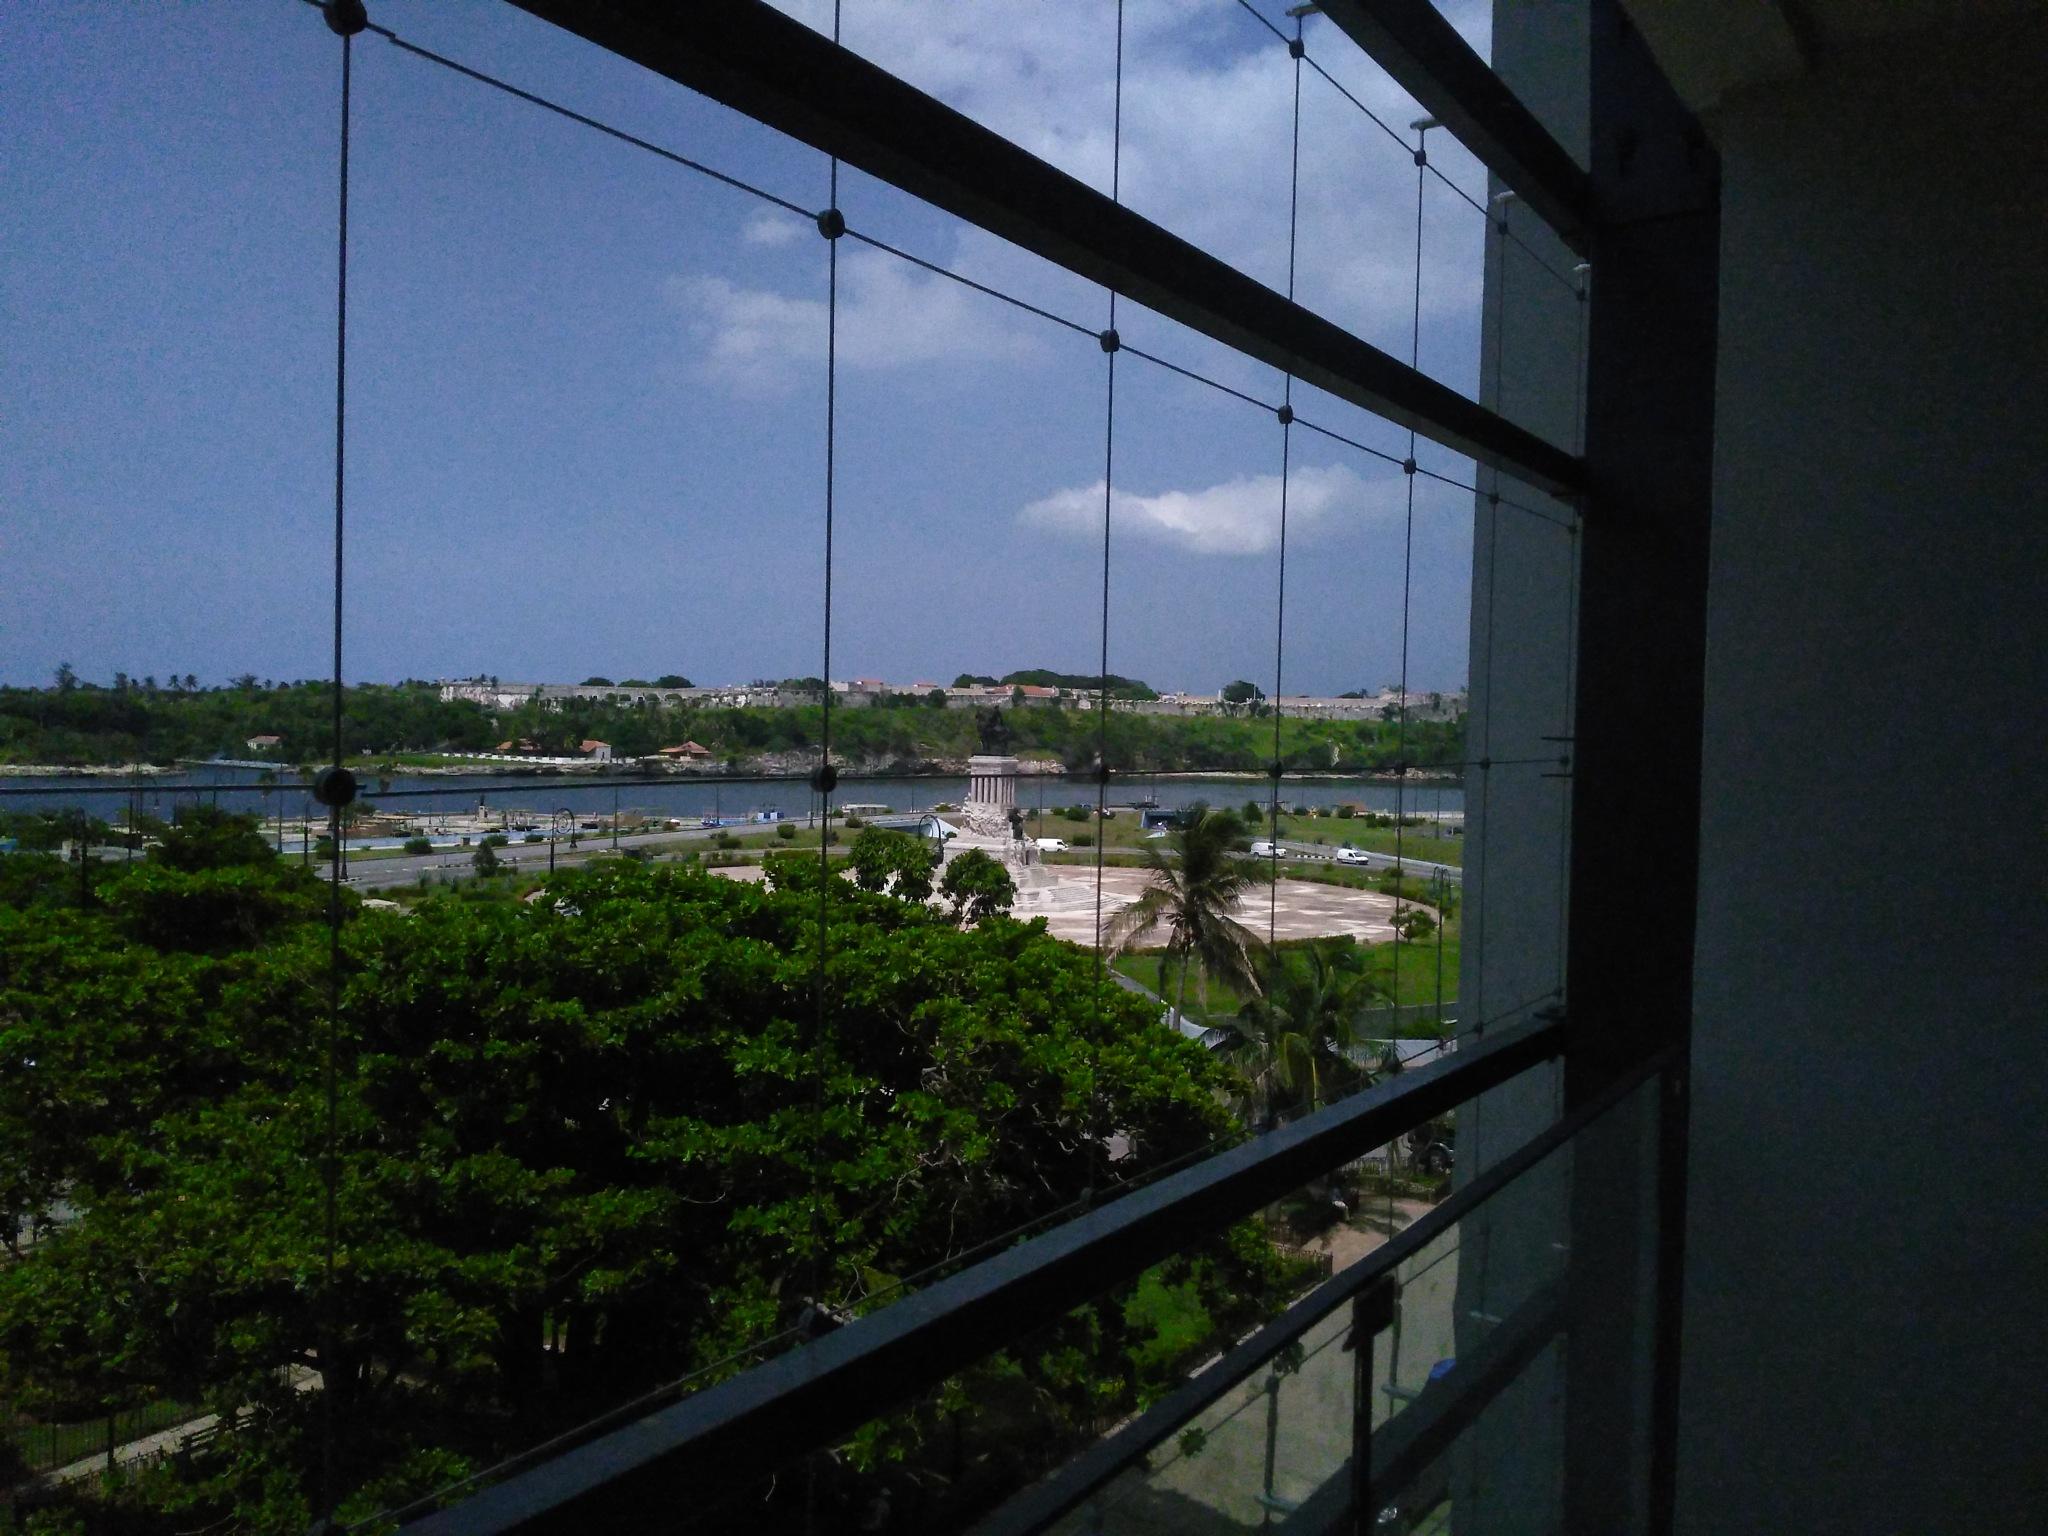 Bay View II by Raul Morejon Aguiar